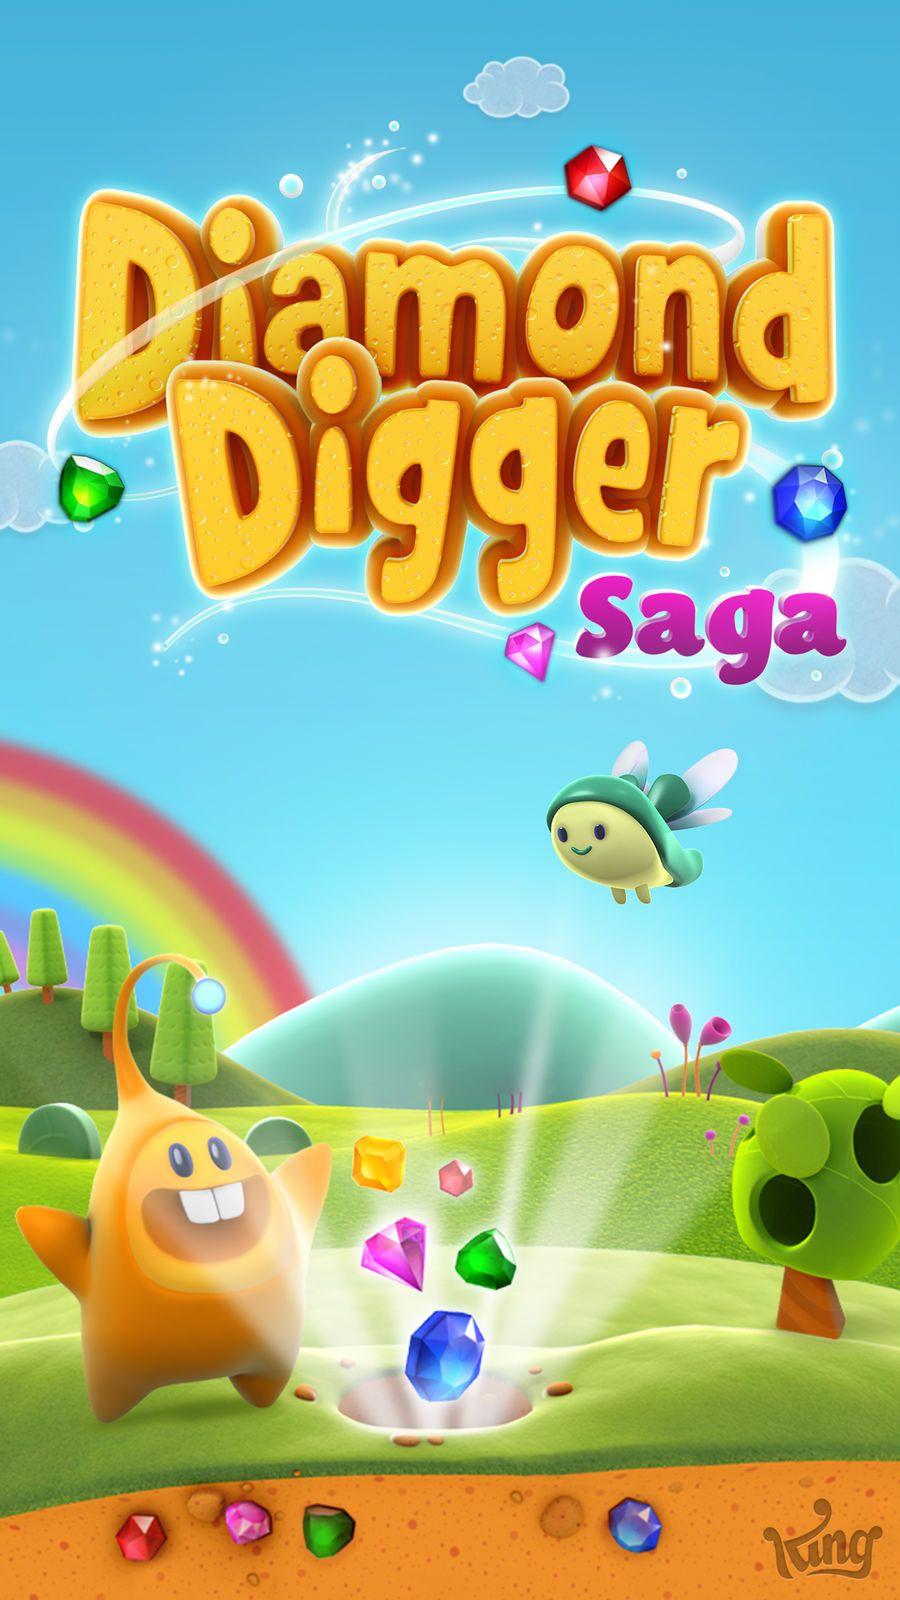 Diamond Digger Saga PuzzleArcadeiosEntertainment